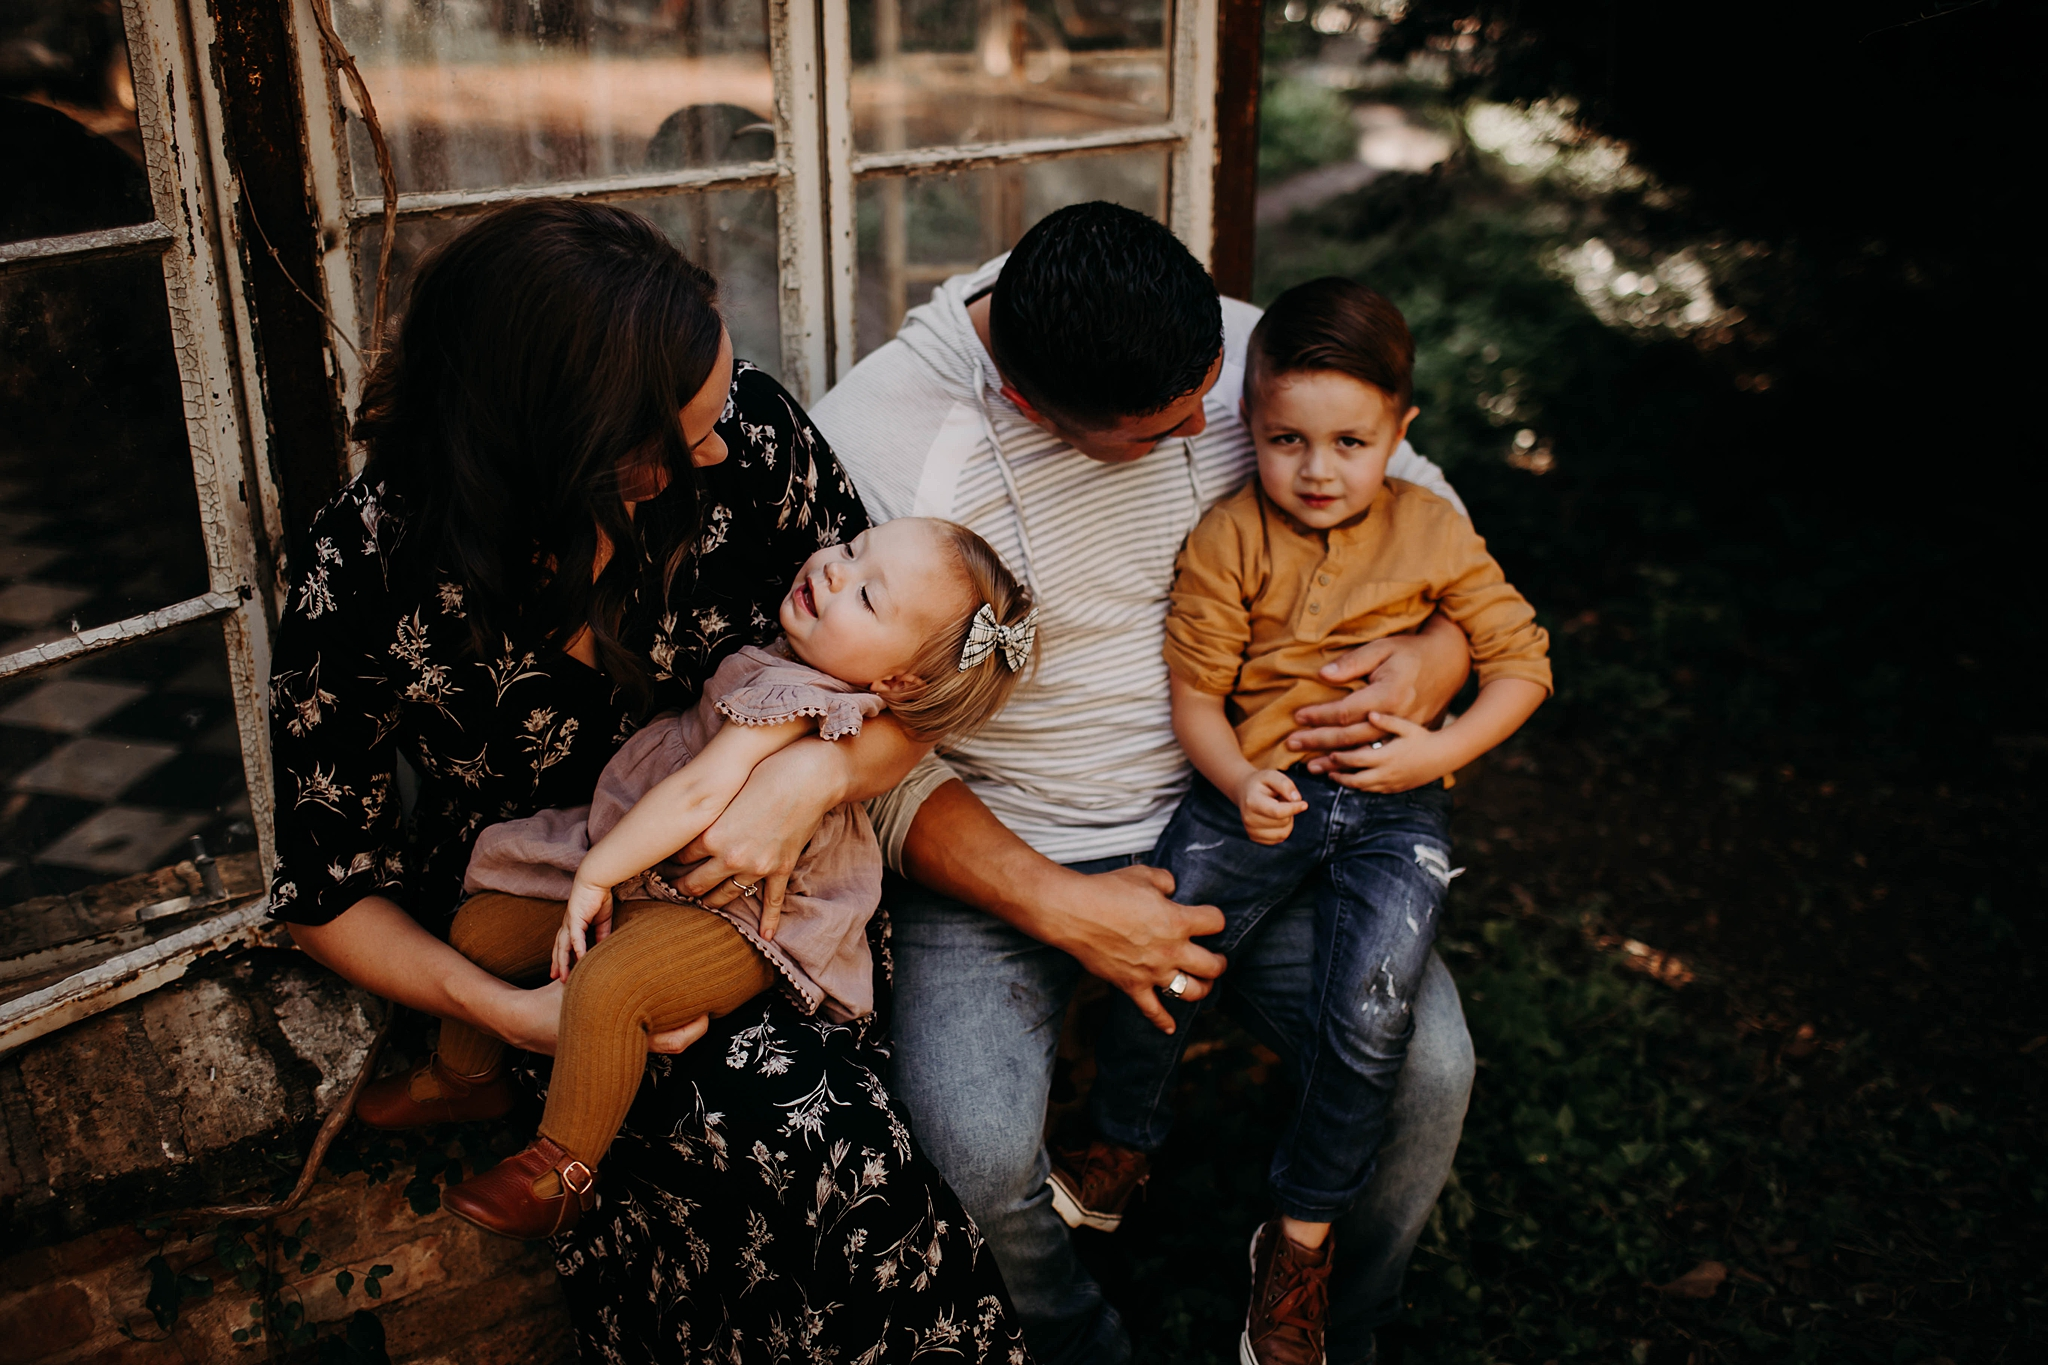 Luera-VMP-San-Antonio-Family-Photography-16_WEB.jpg